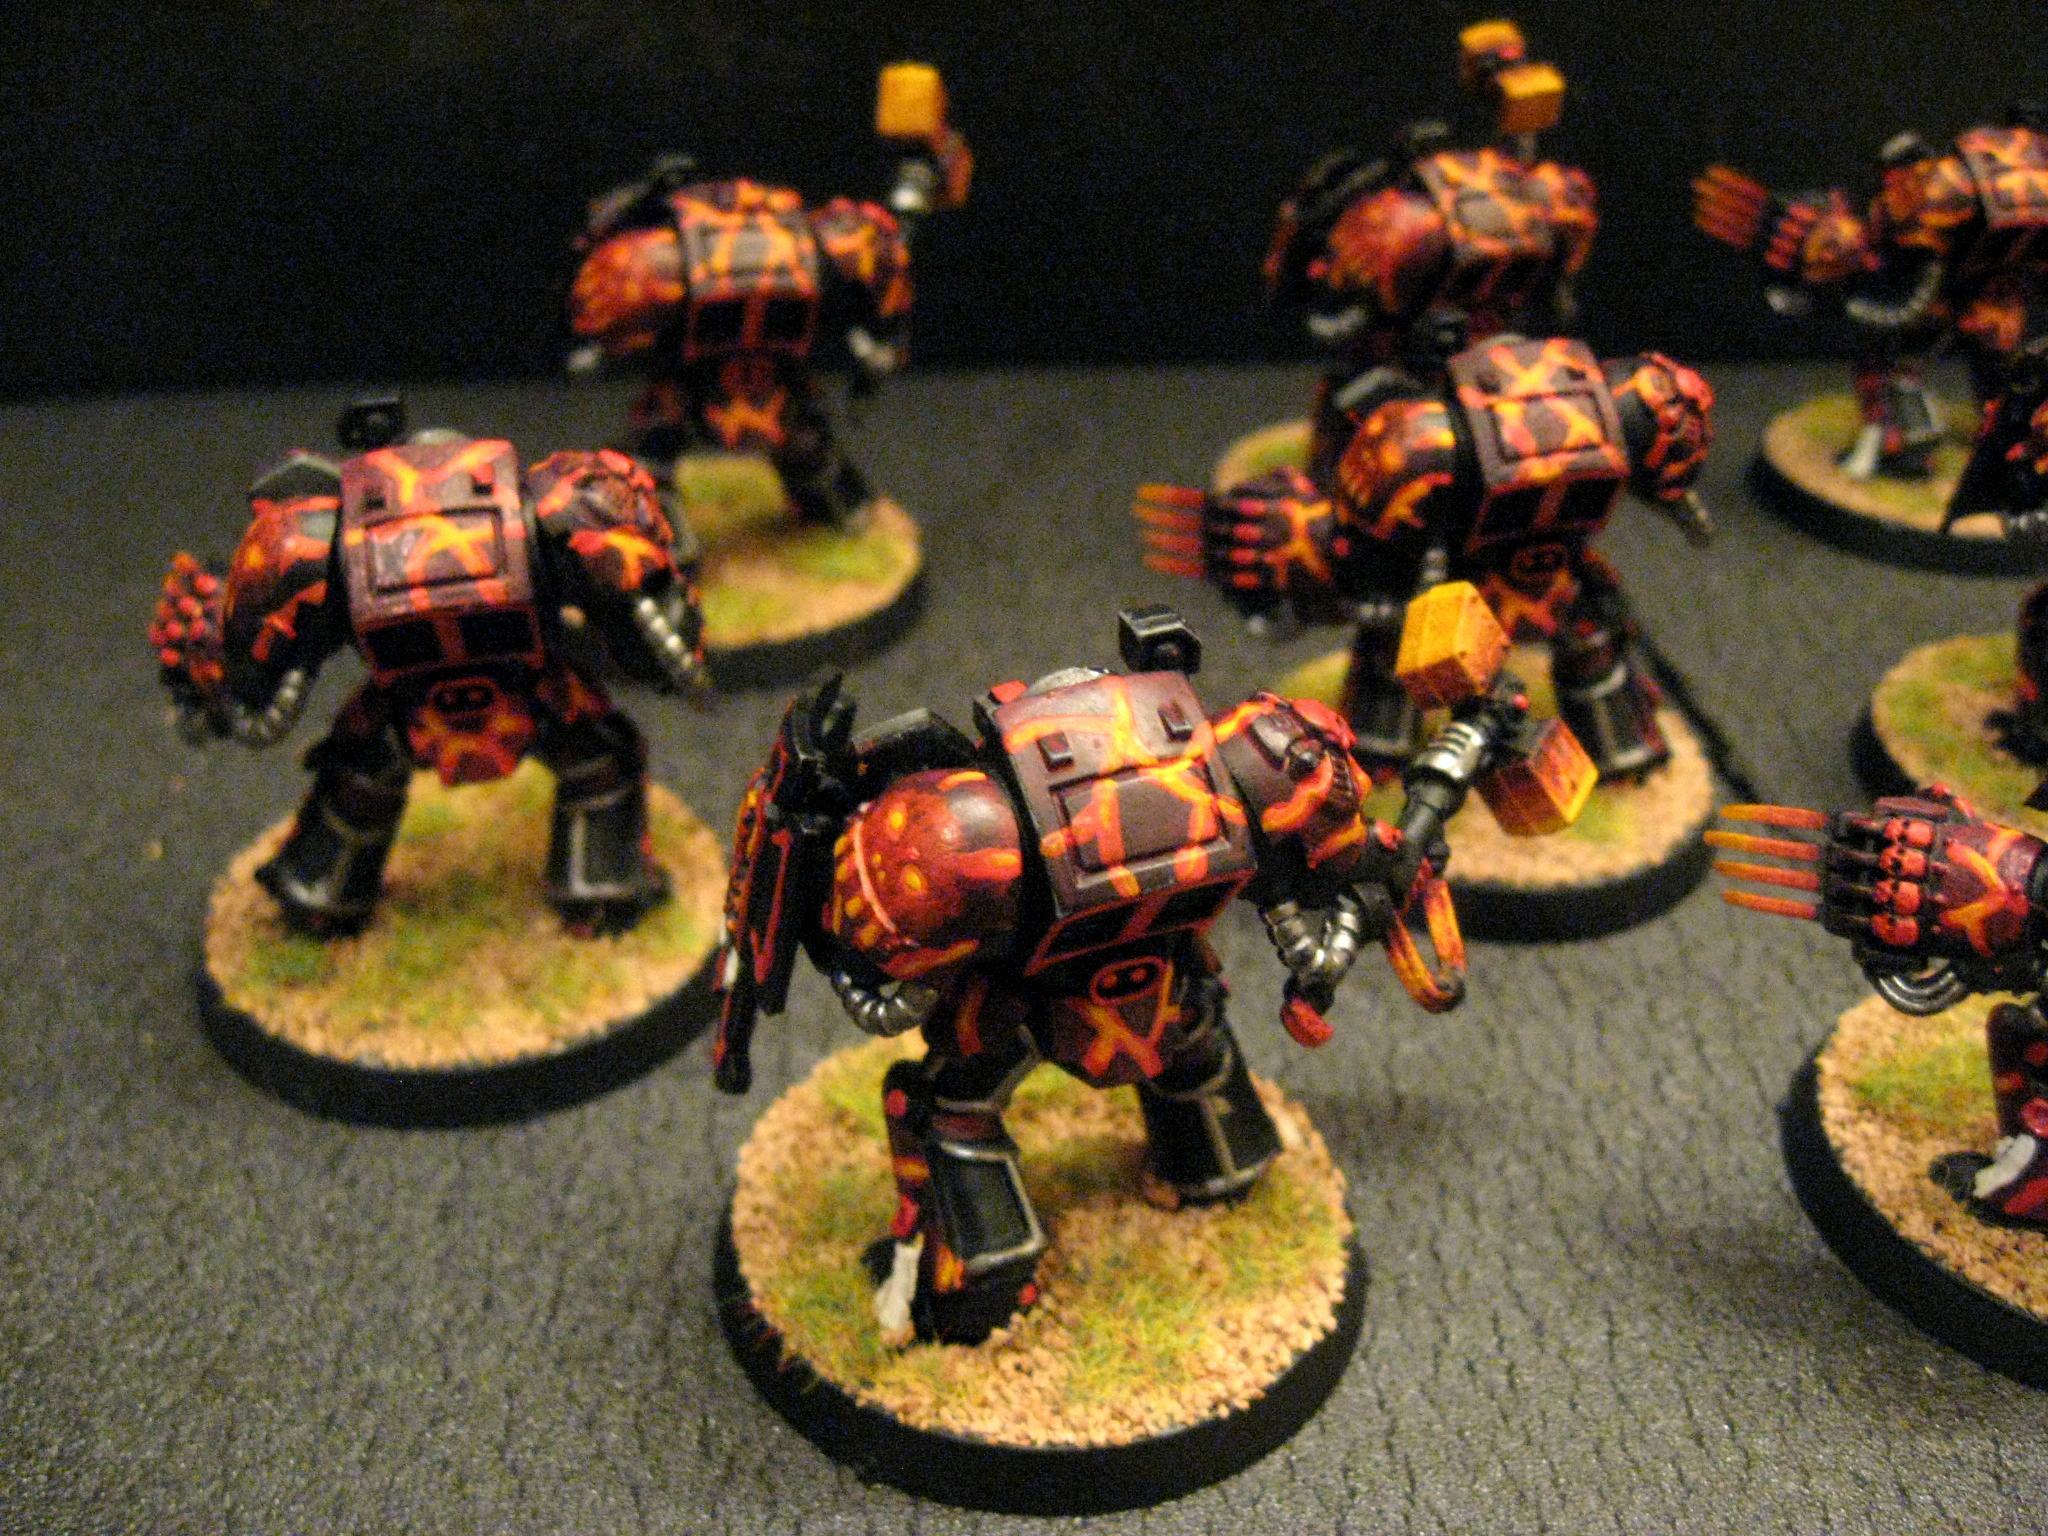 Chapter, Custom, Land Raider, Predator, Rhino, Salamanders, Space Marines, Tactical, Terminator Armor, Terminator Assault Squad, Vanilla, Vulkan